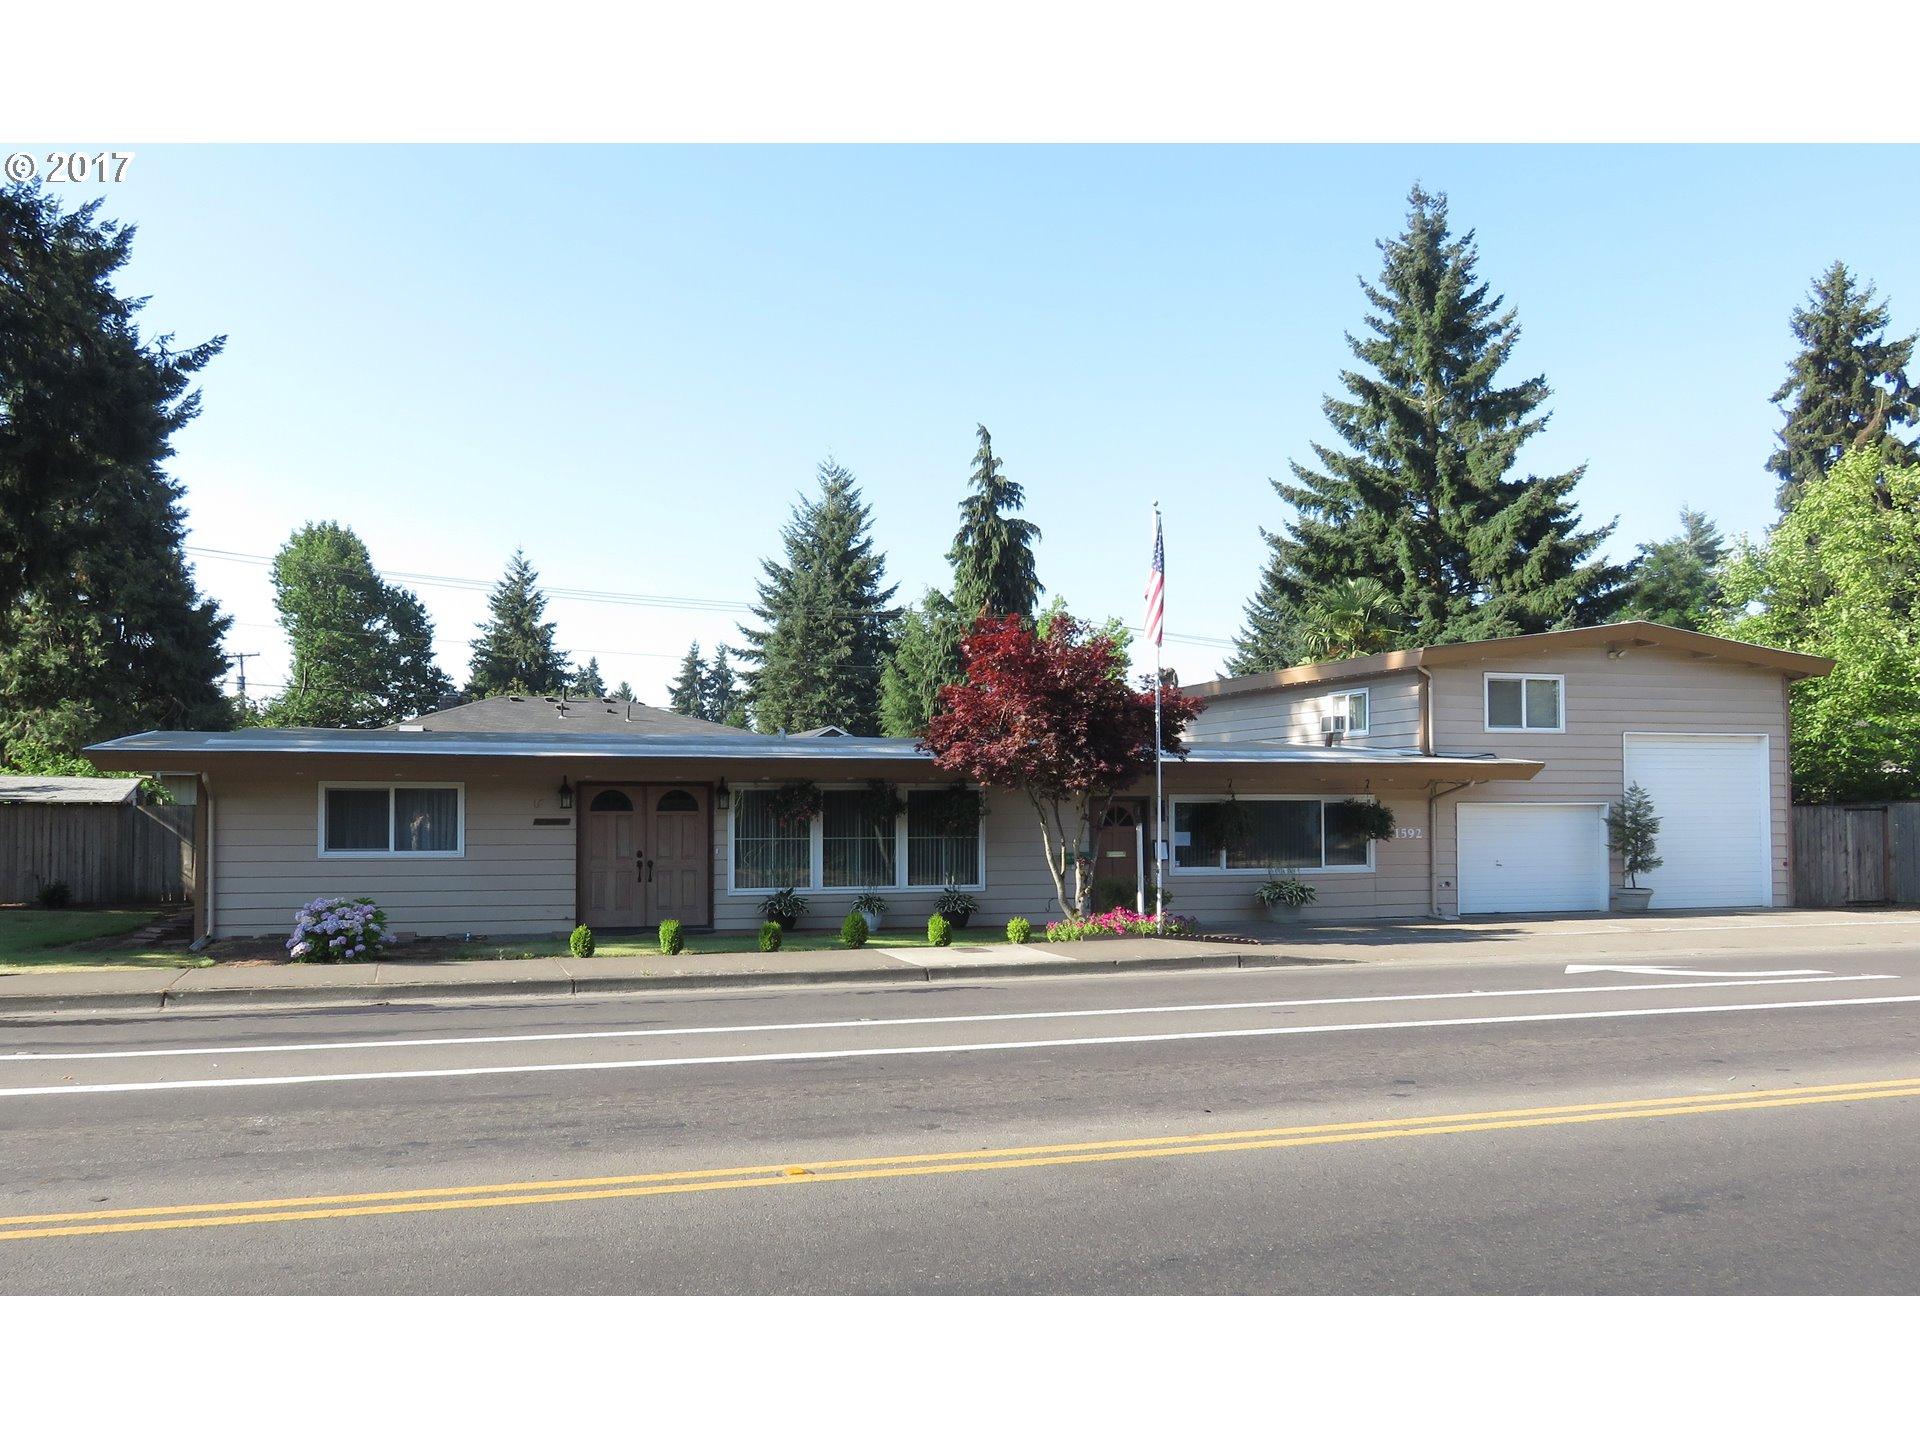 1592 GREEN ACRES RD, Eugene, OR 97408